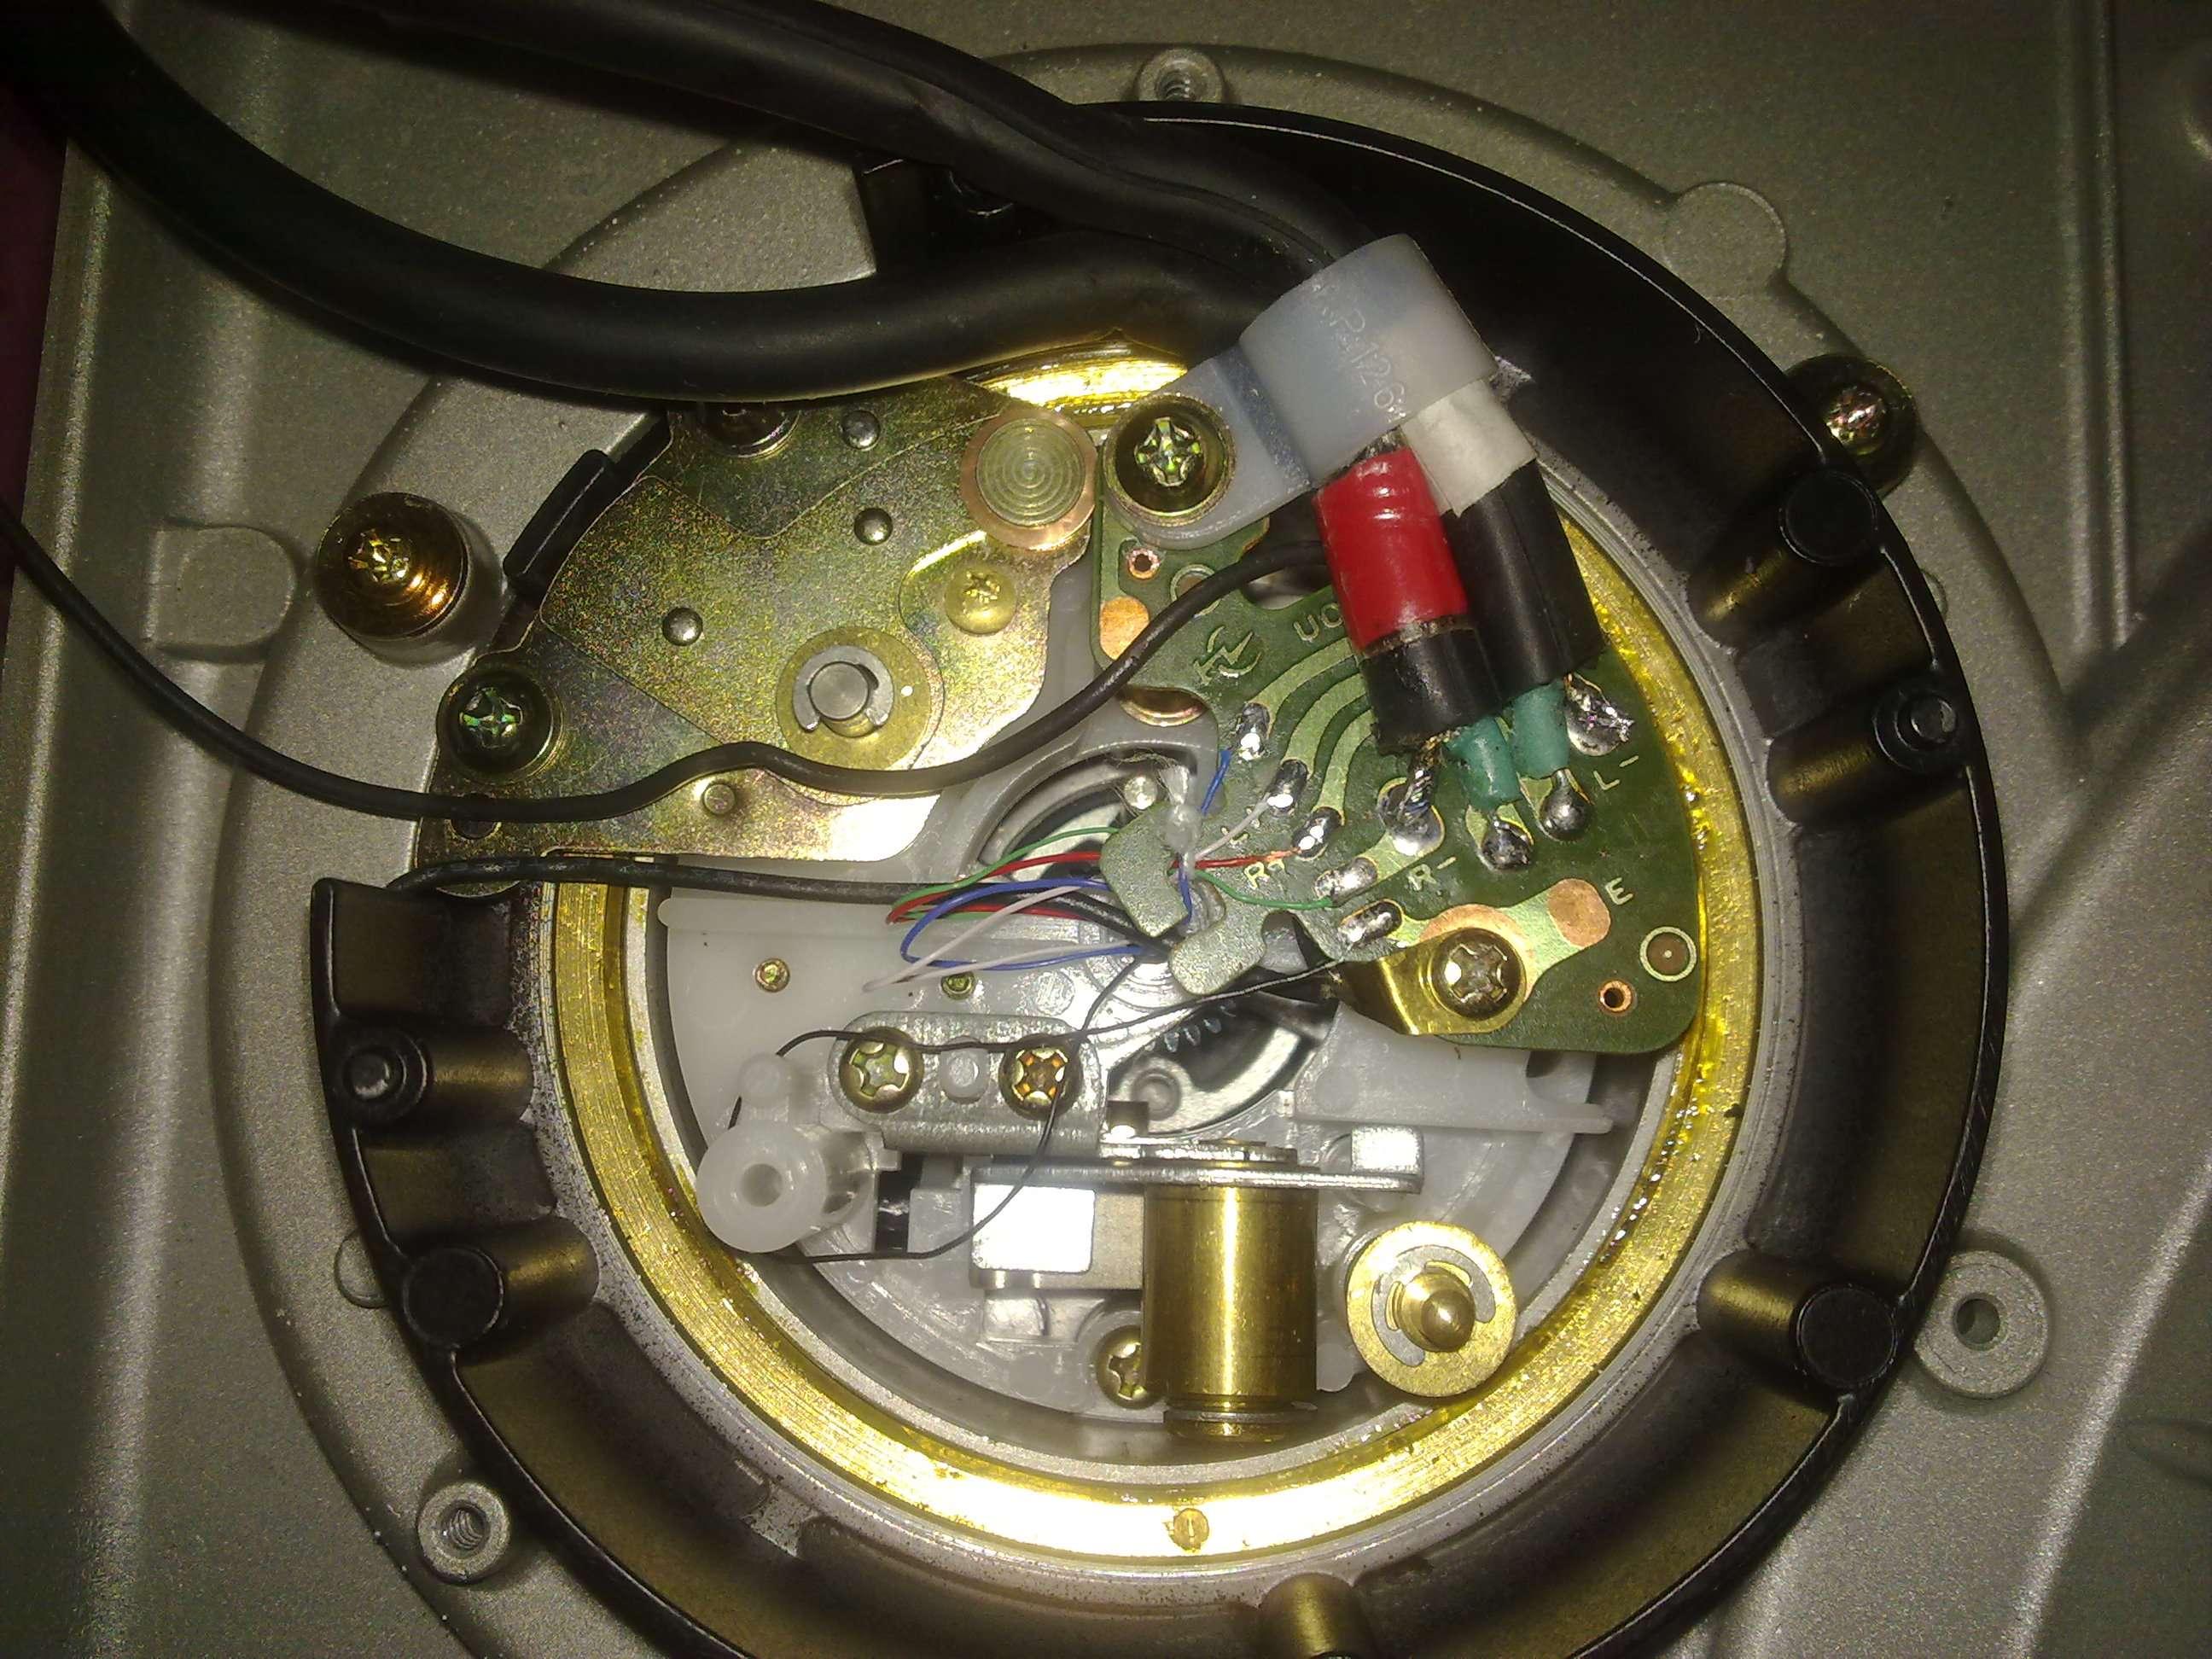 13finalasmclose technics sl 1200 mk2 tonearm rewire mod page 3 audiokarma home technics 1200 tonearm wiring diagram at readyjetset.co